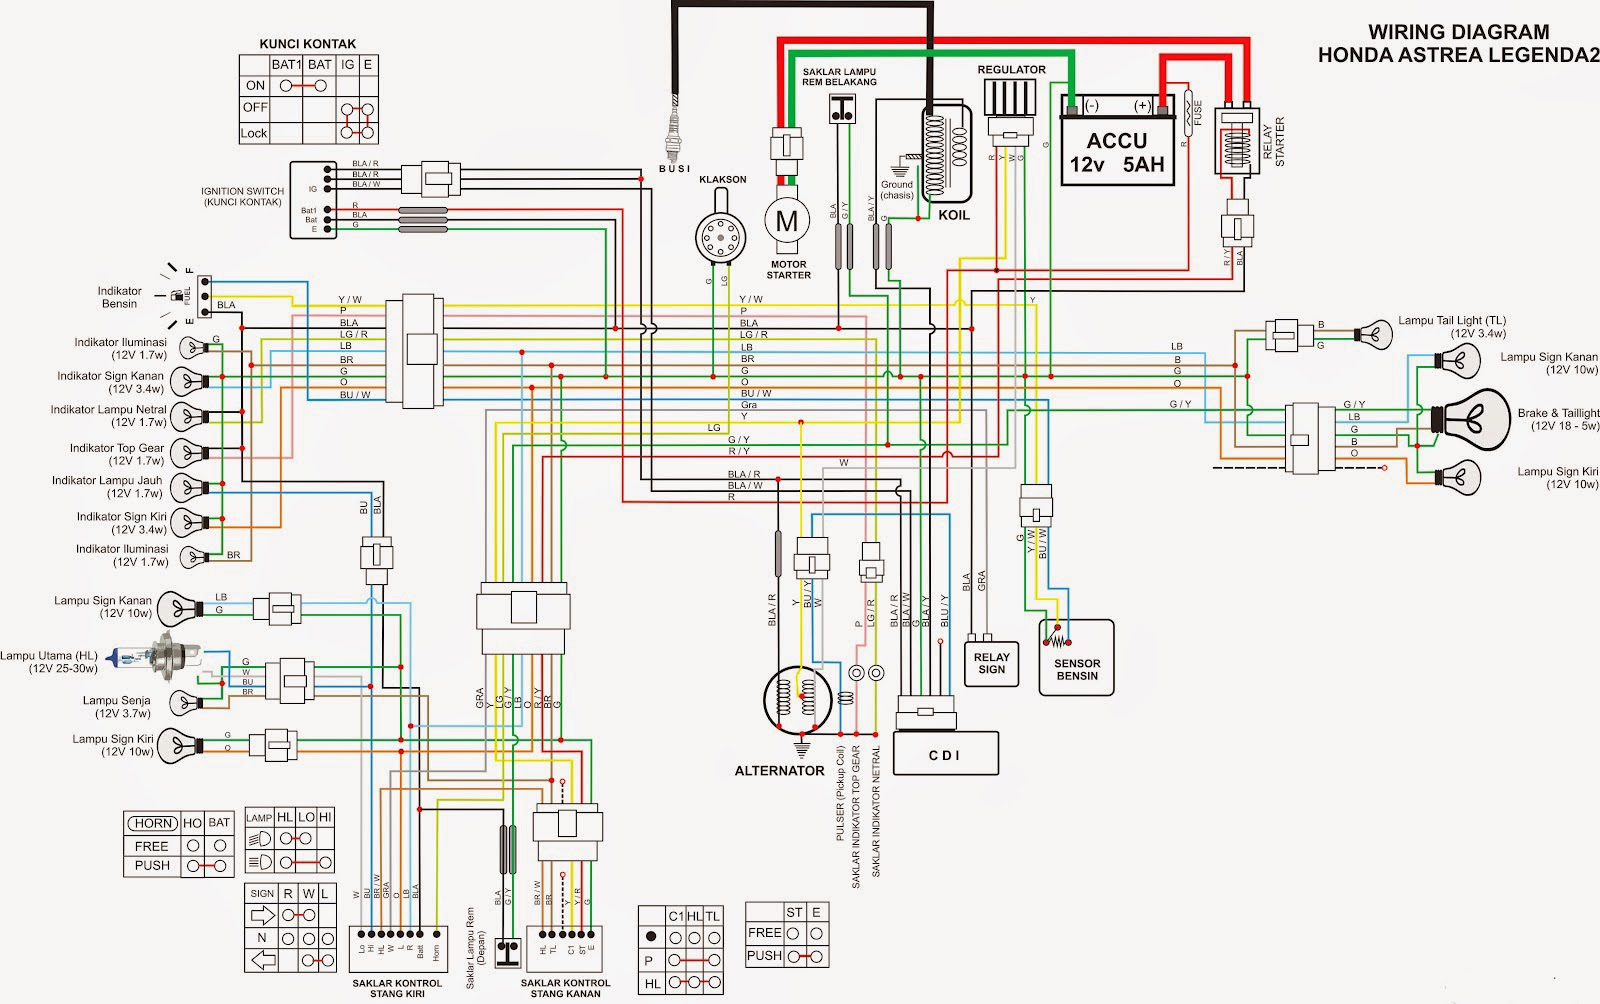 amazing blueprint wiring lampu honda wave 100 ensign diagram honda cb750 wiring diagram mesmerizing honda dream 100cc wiring diagram gallery best image